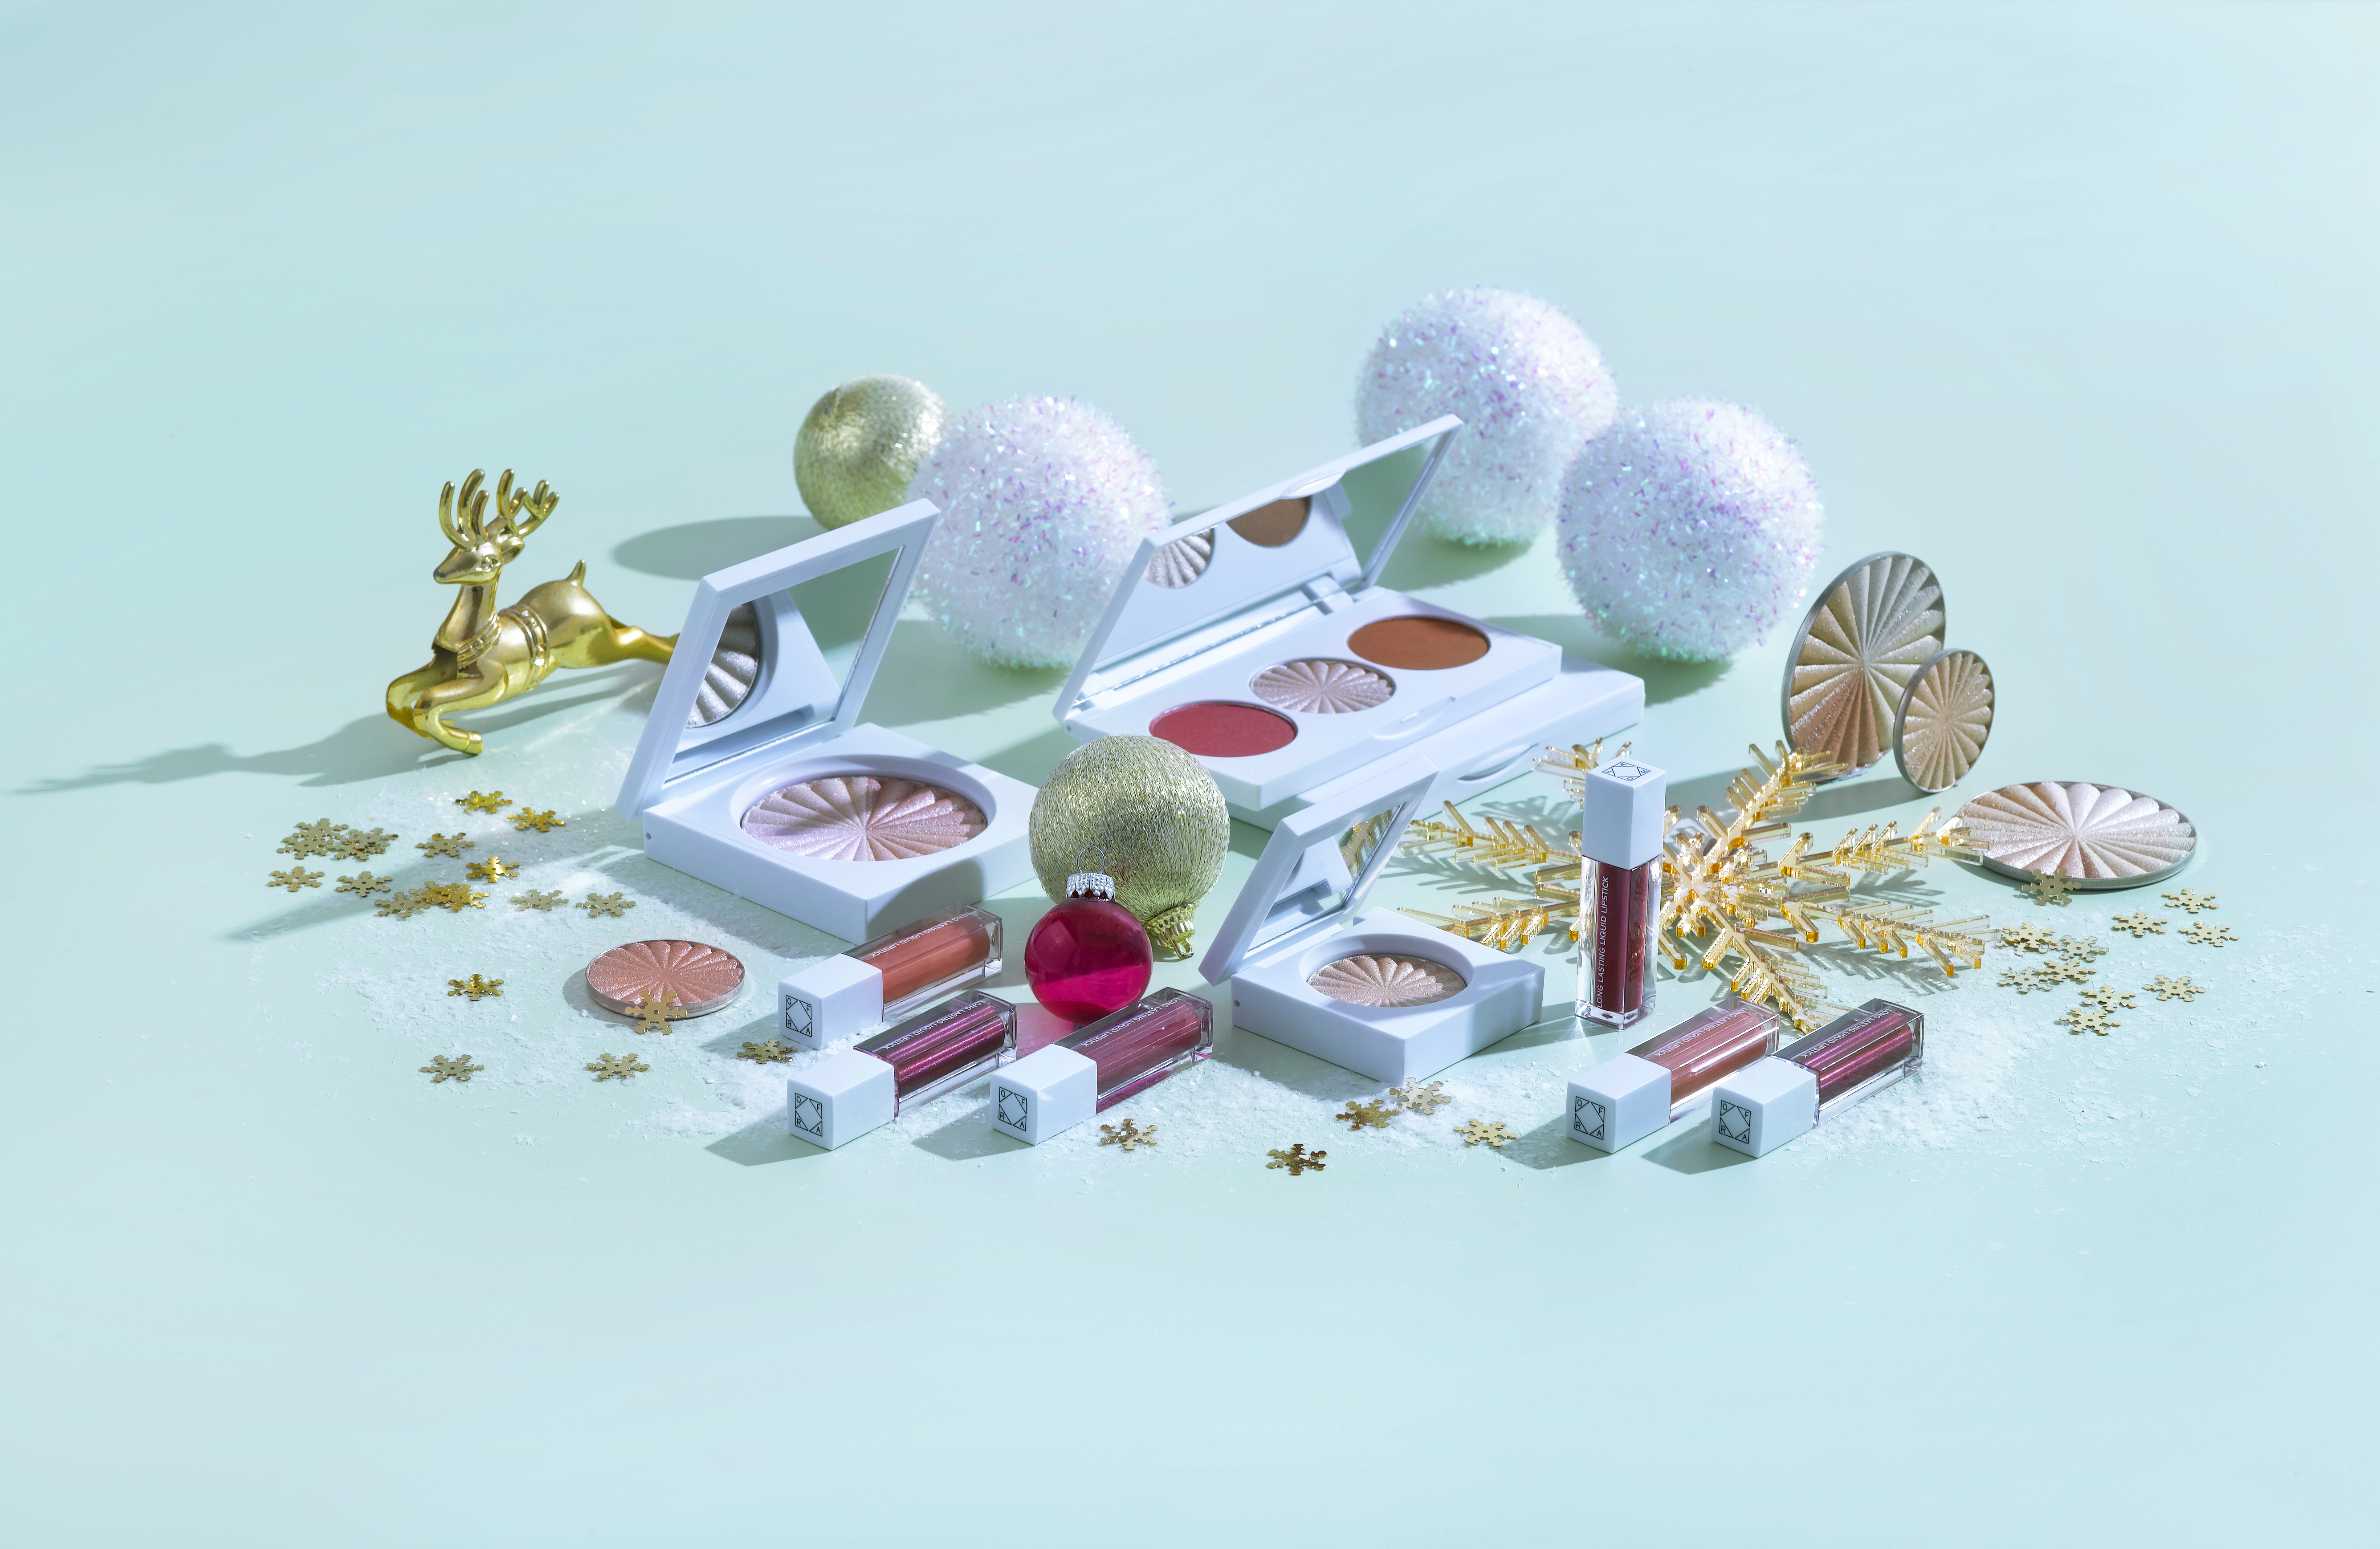 ofra-cosmetics-00052.jpg